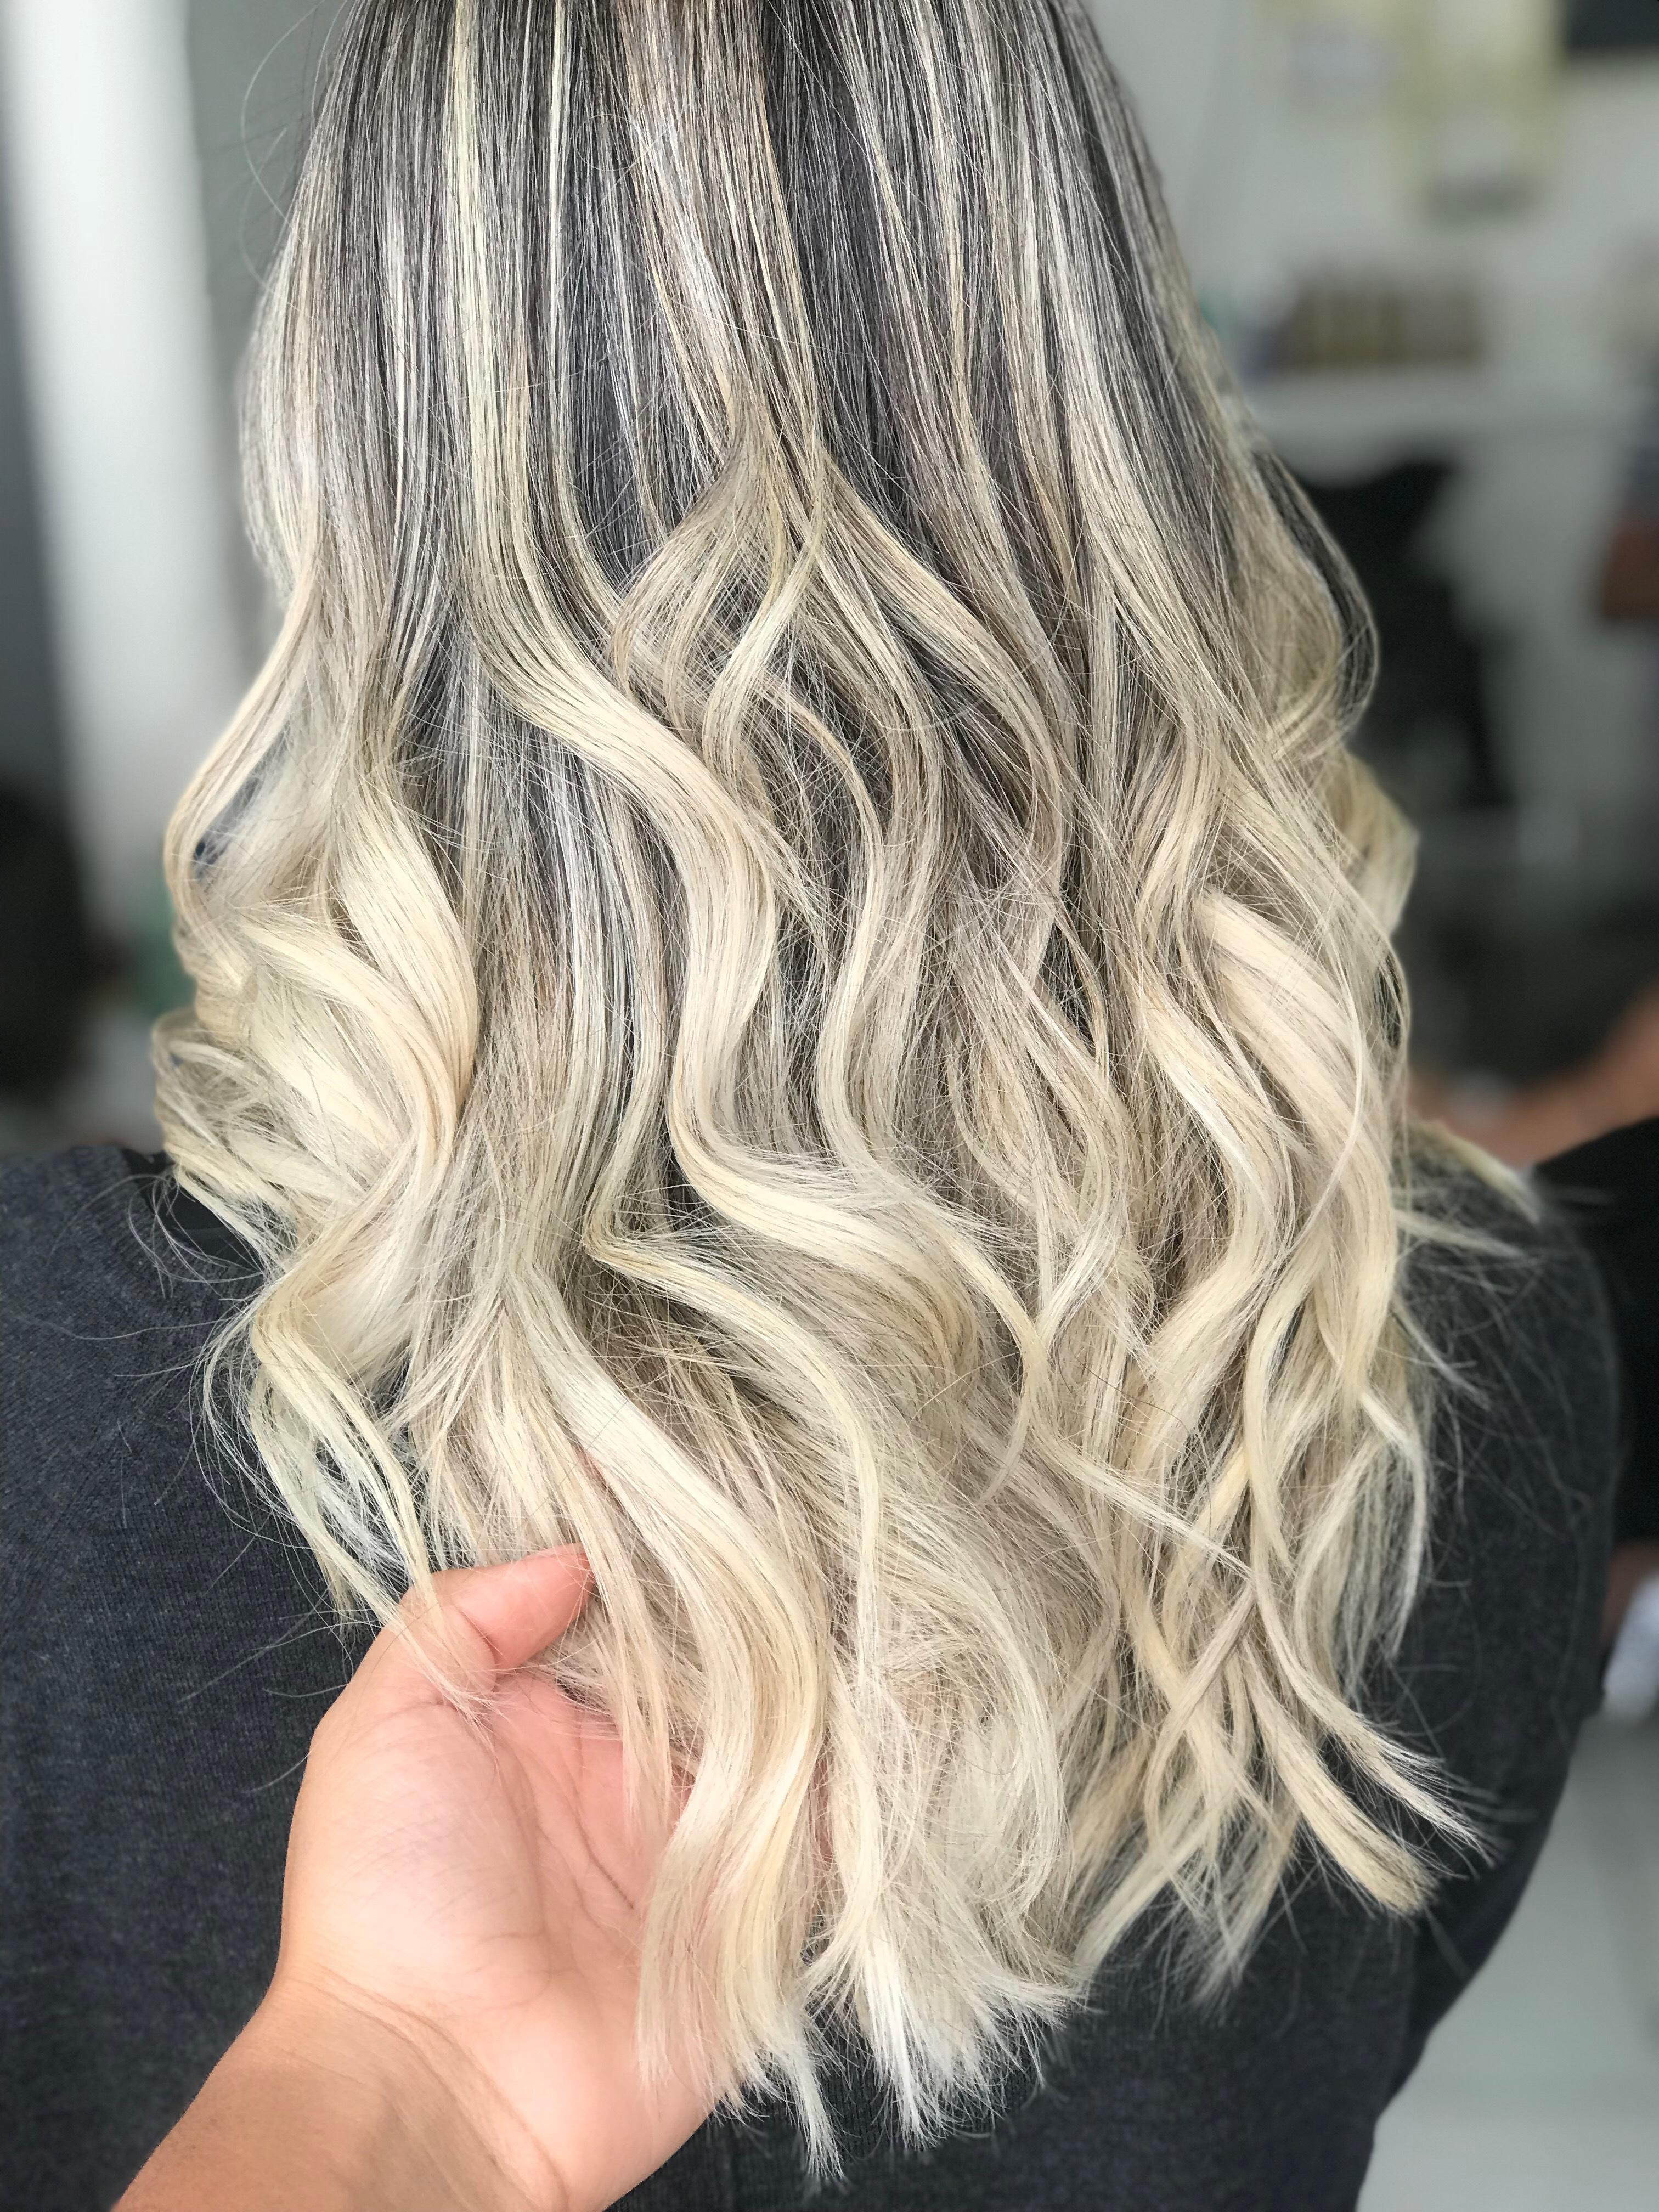 Loiro diamond 💎  cabelo cabeleireiro(a) maquiador(a)